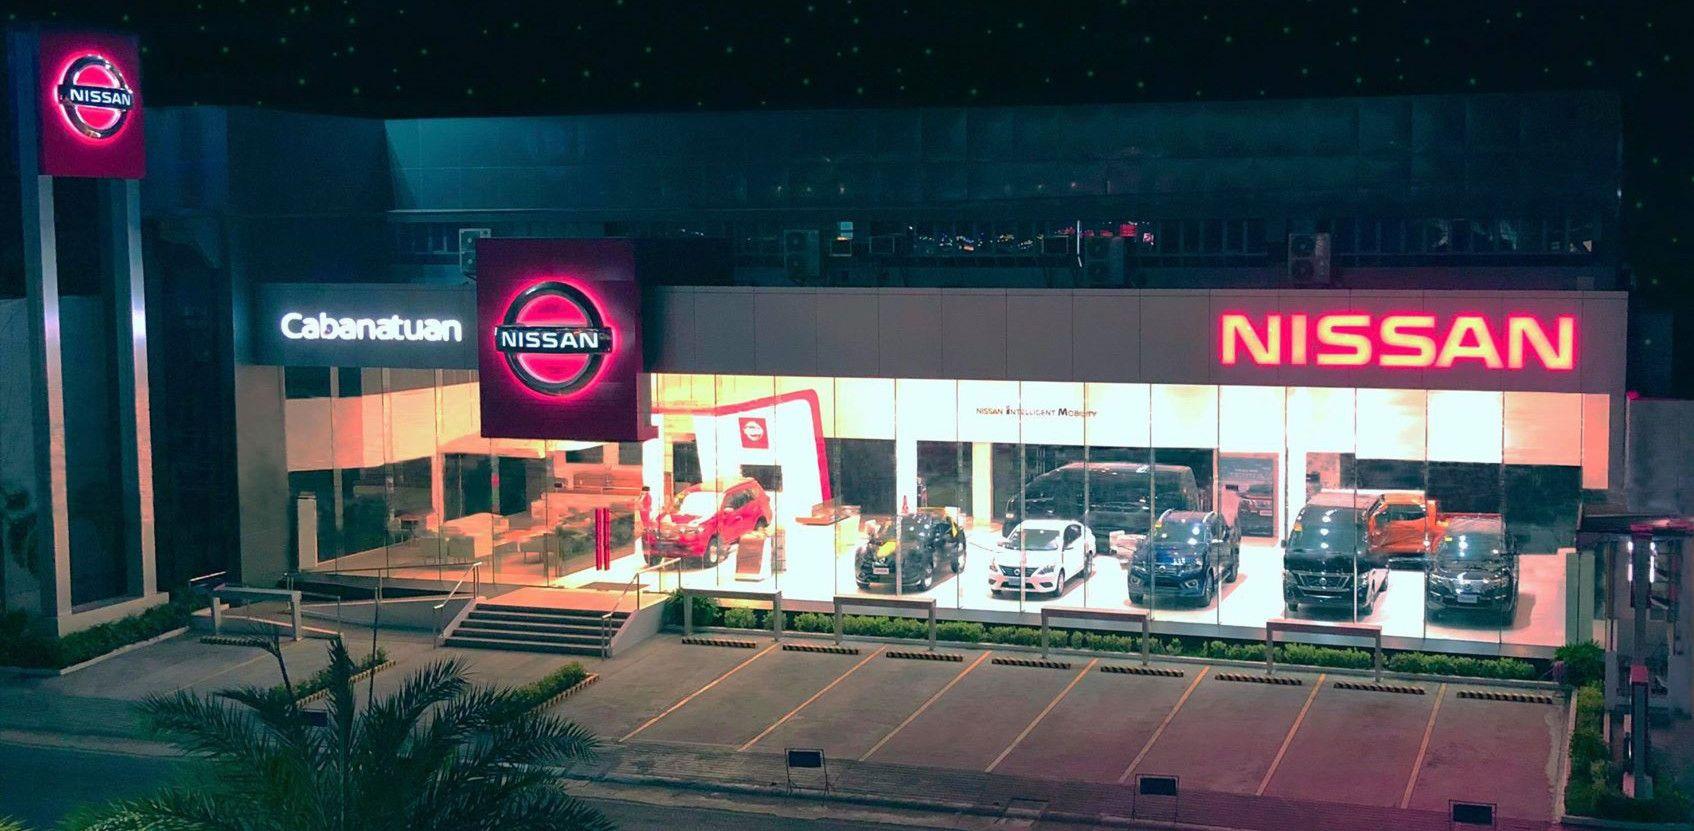 nissan ph officially opens new dealership in cabanatuan nissan dealership japanese cars pinterest